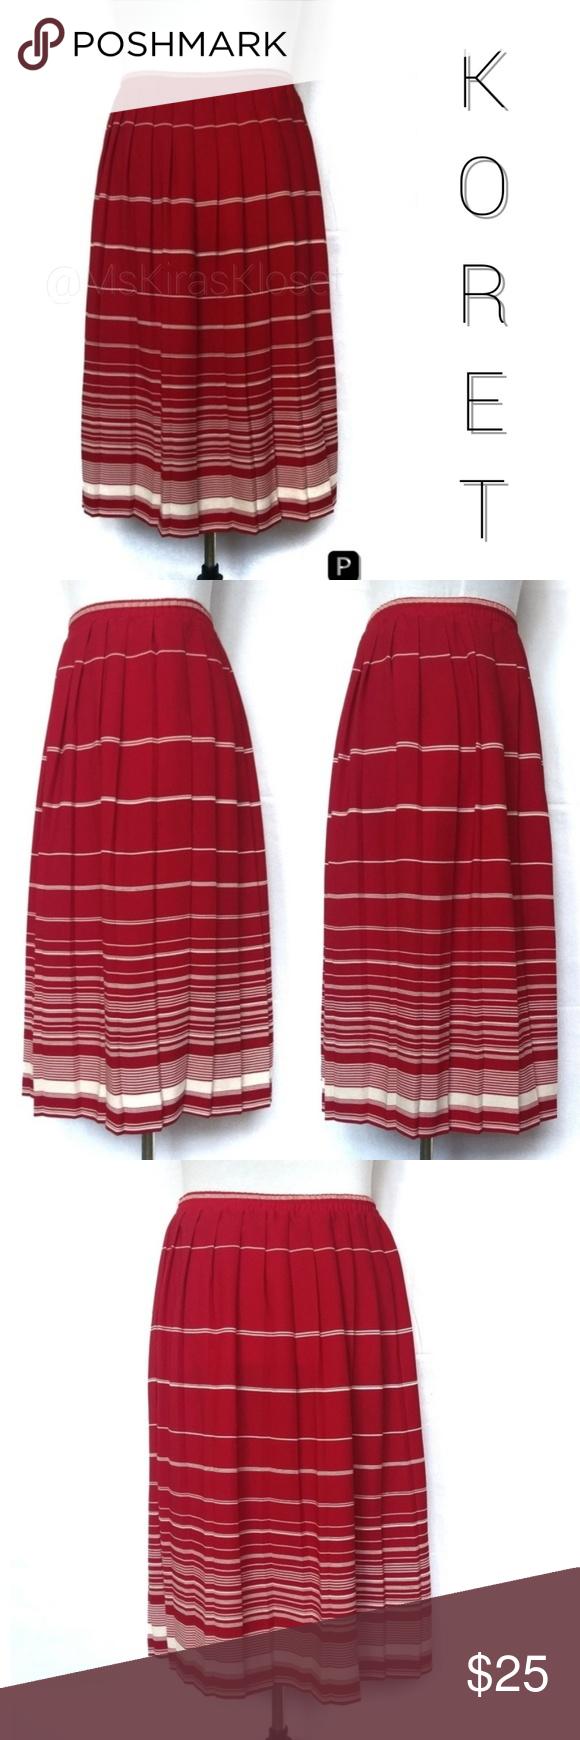 Red and white striped Koret skirt